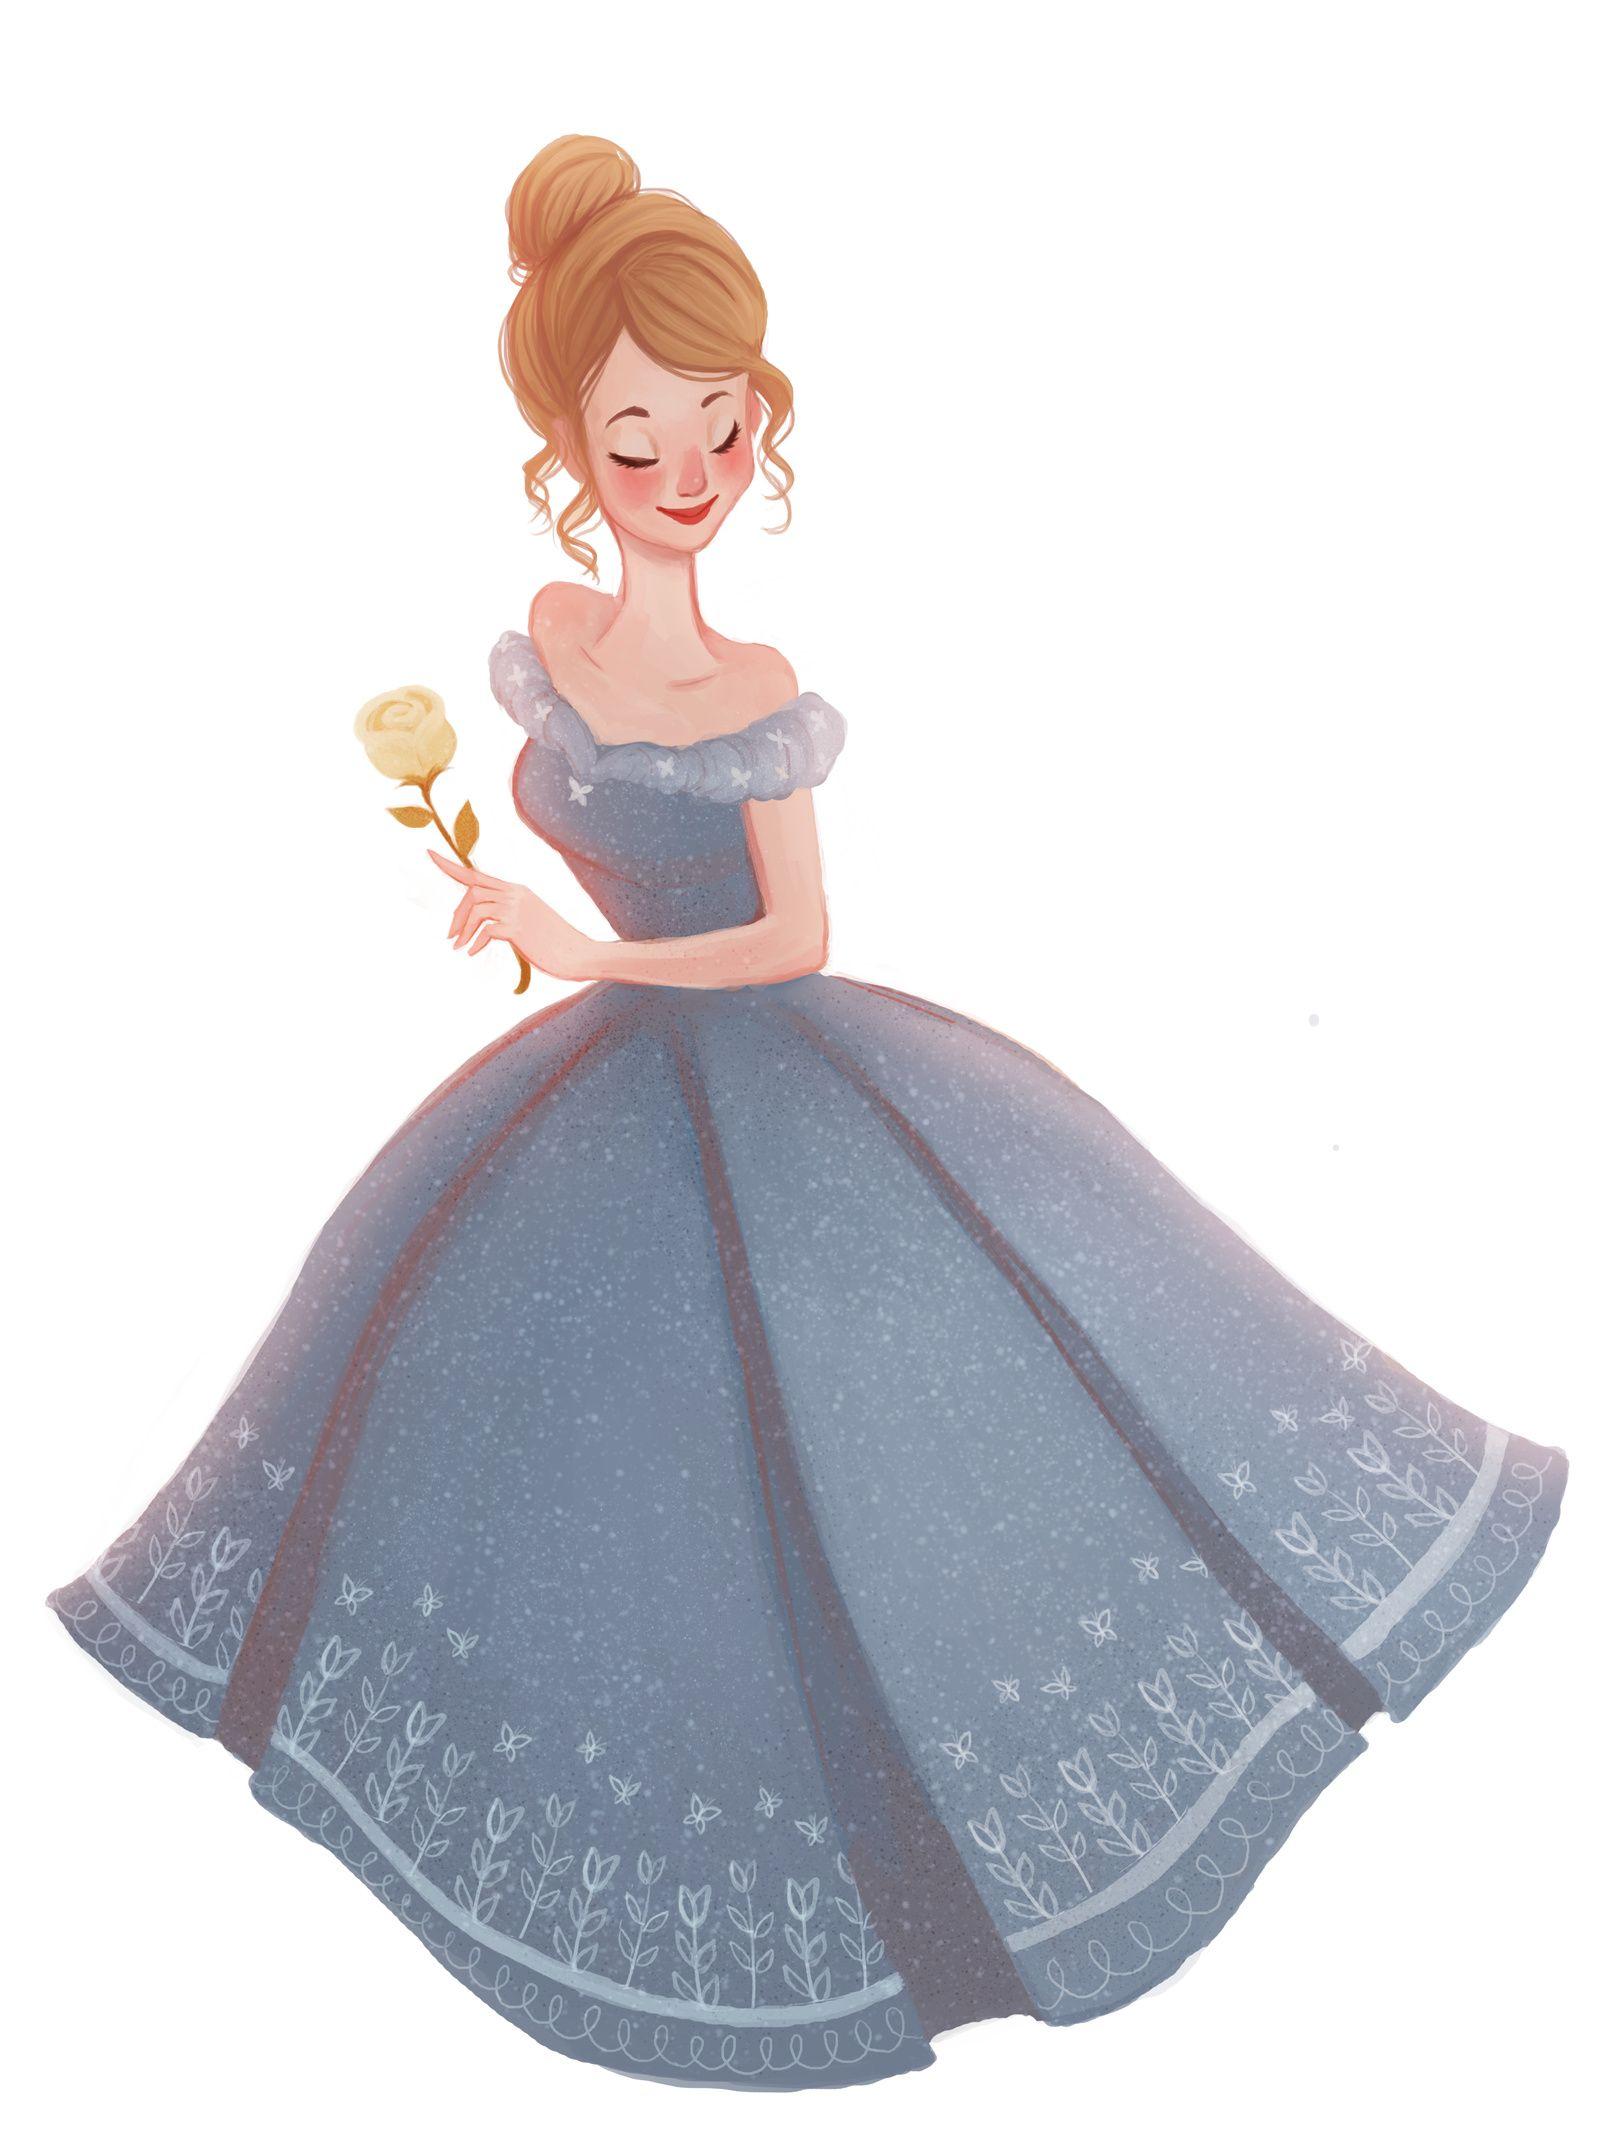 Diana Pedott Illustration - Illustration